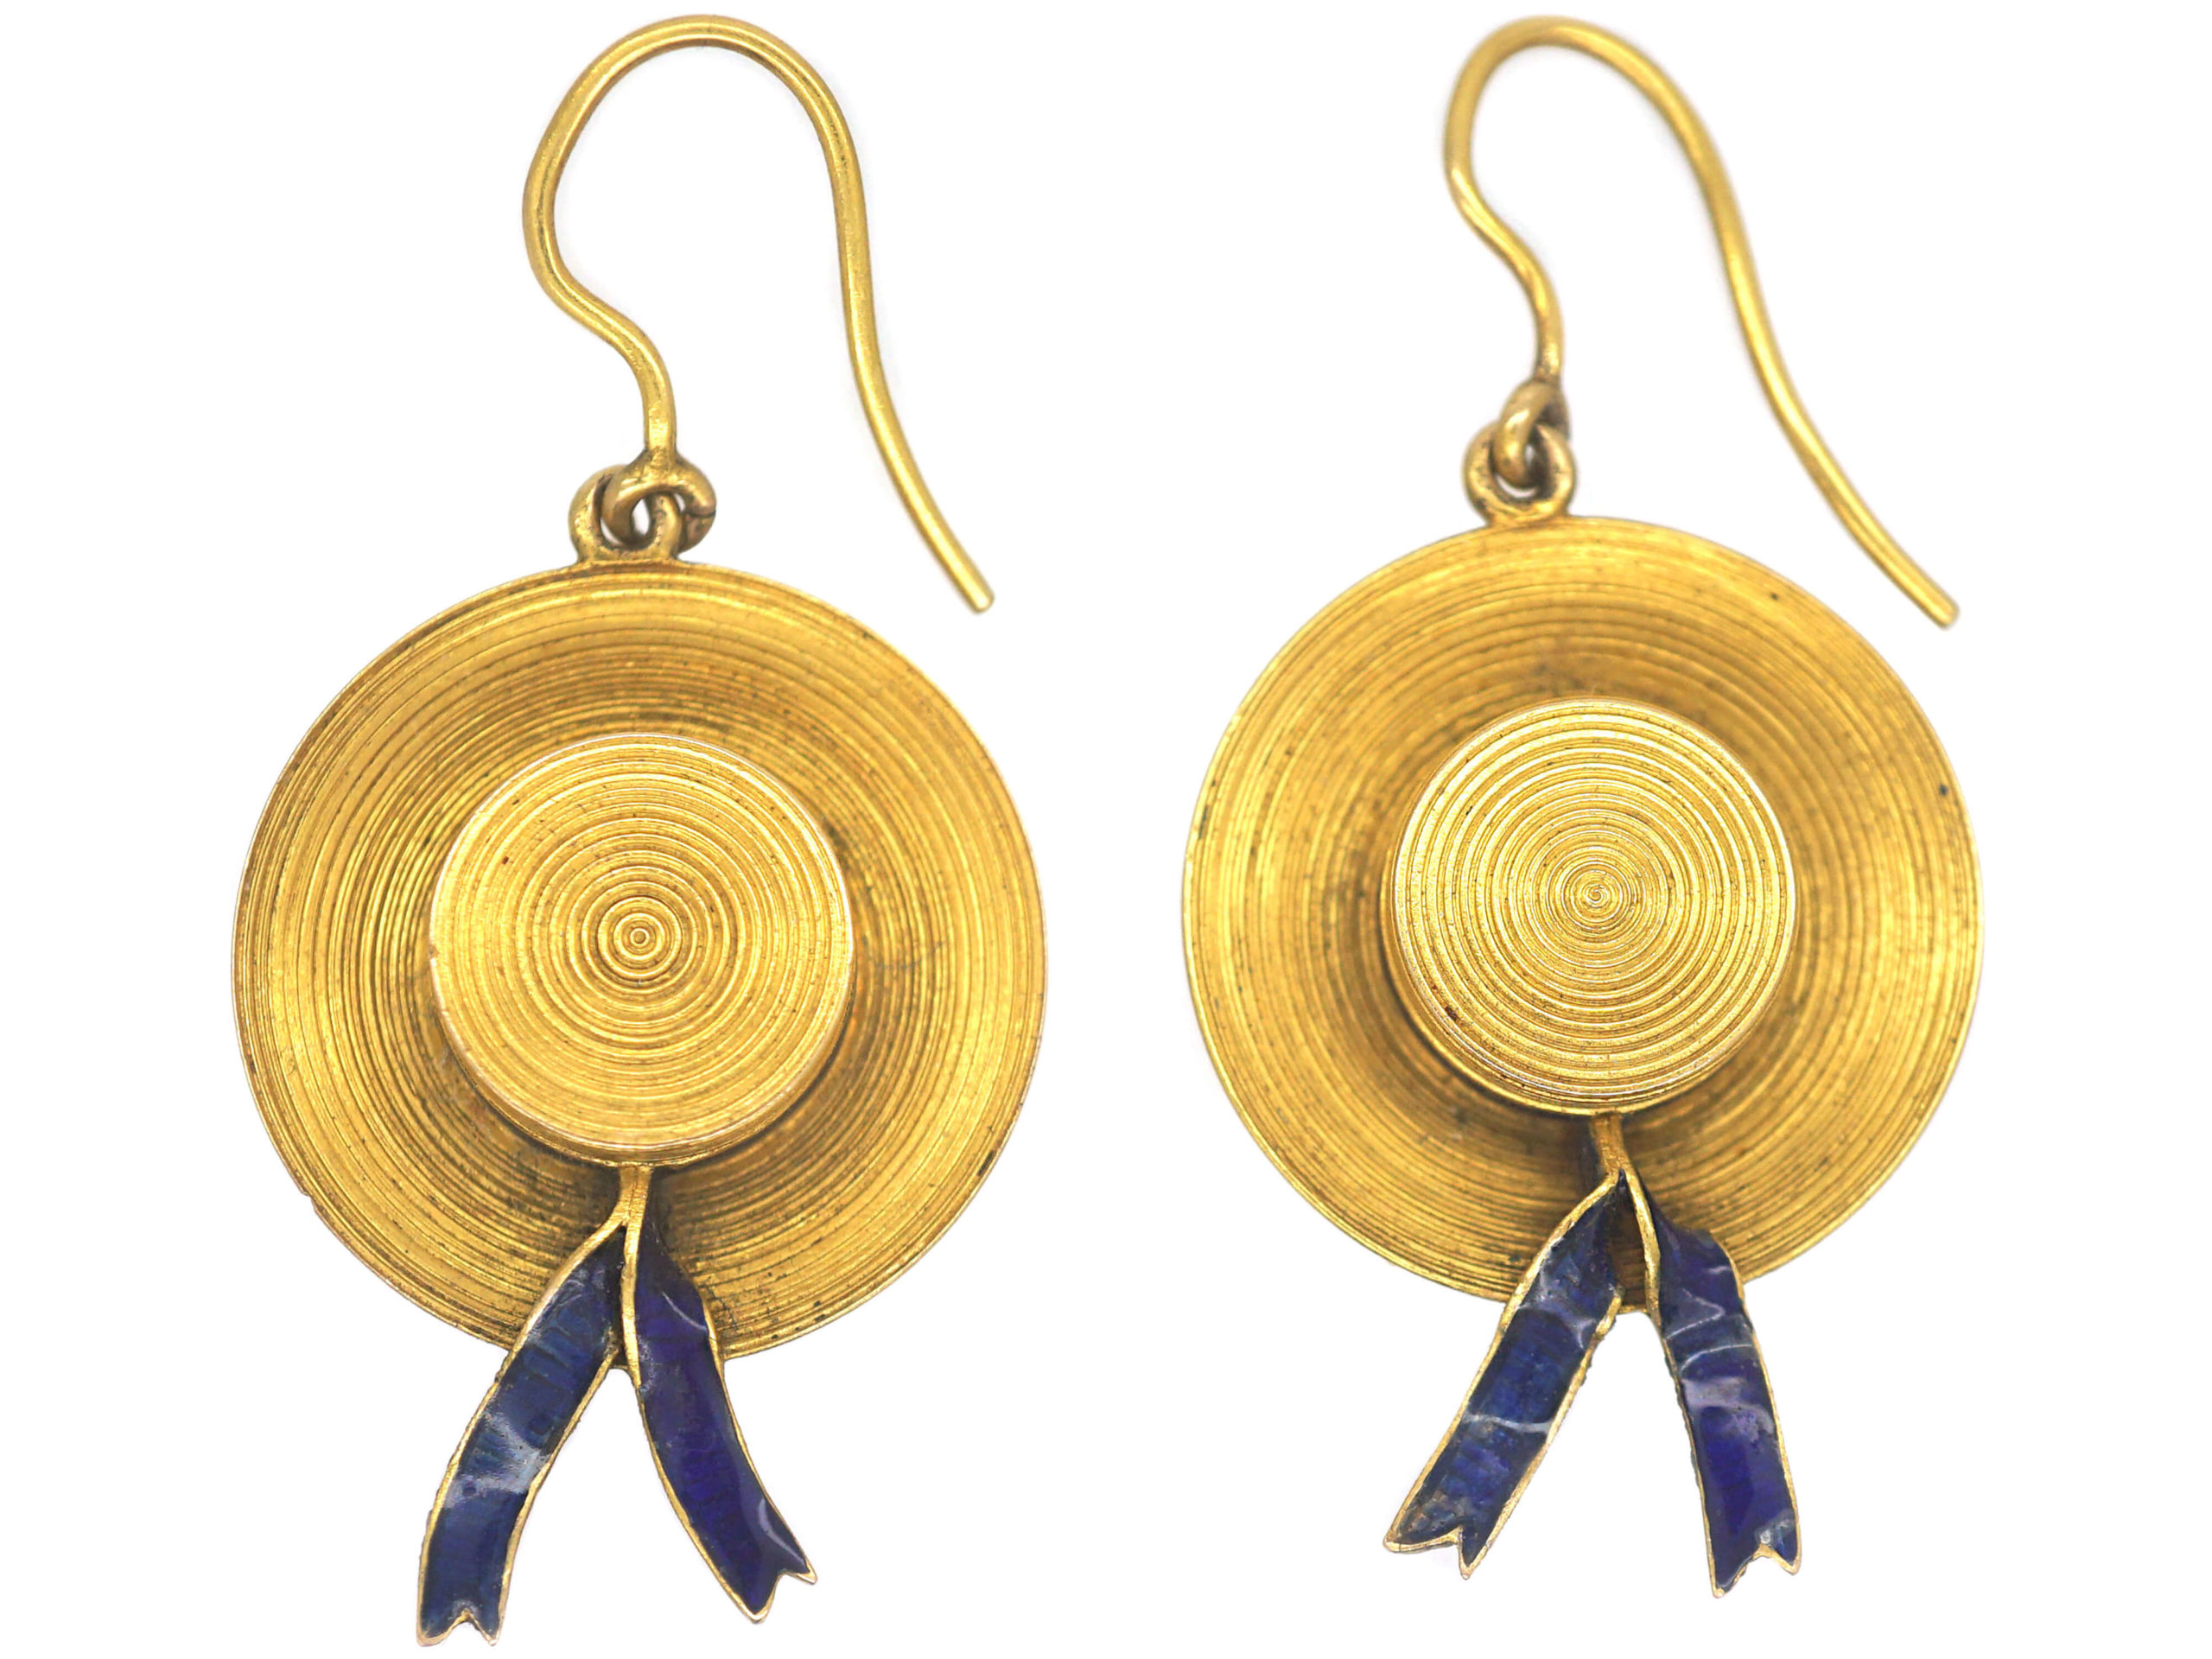 Victorian 15ct Gold & Blue Enamel Sailor's Hat Earrings